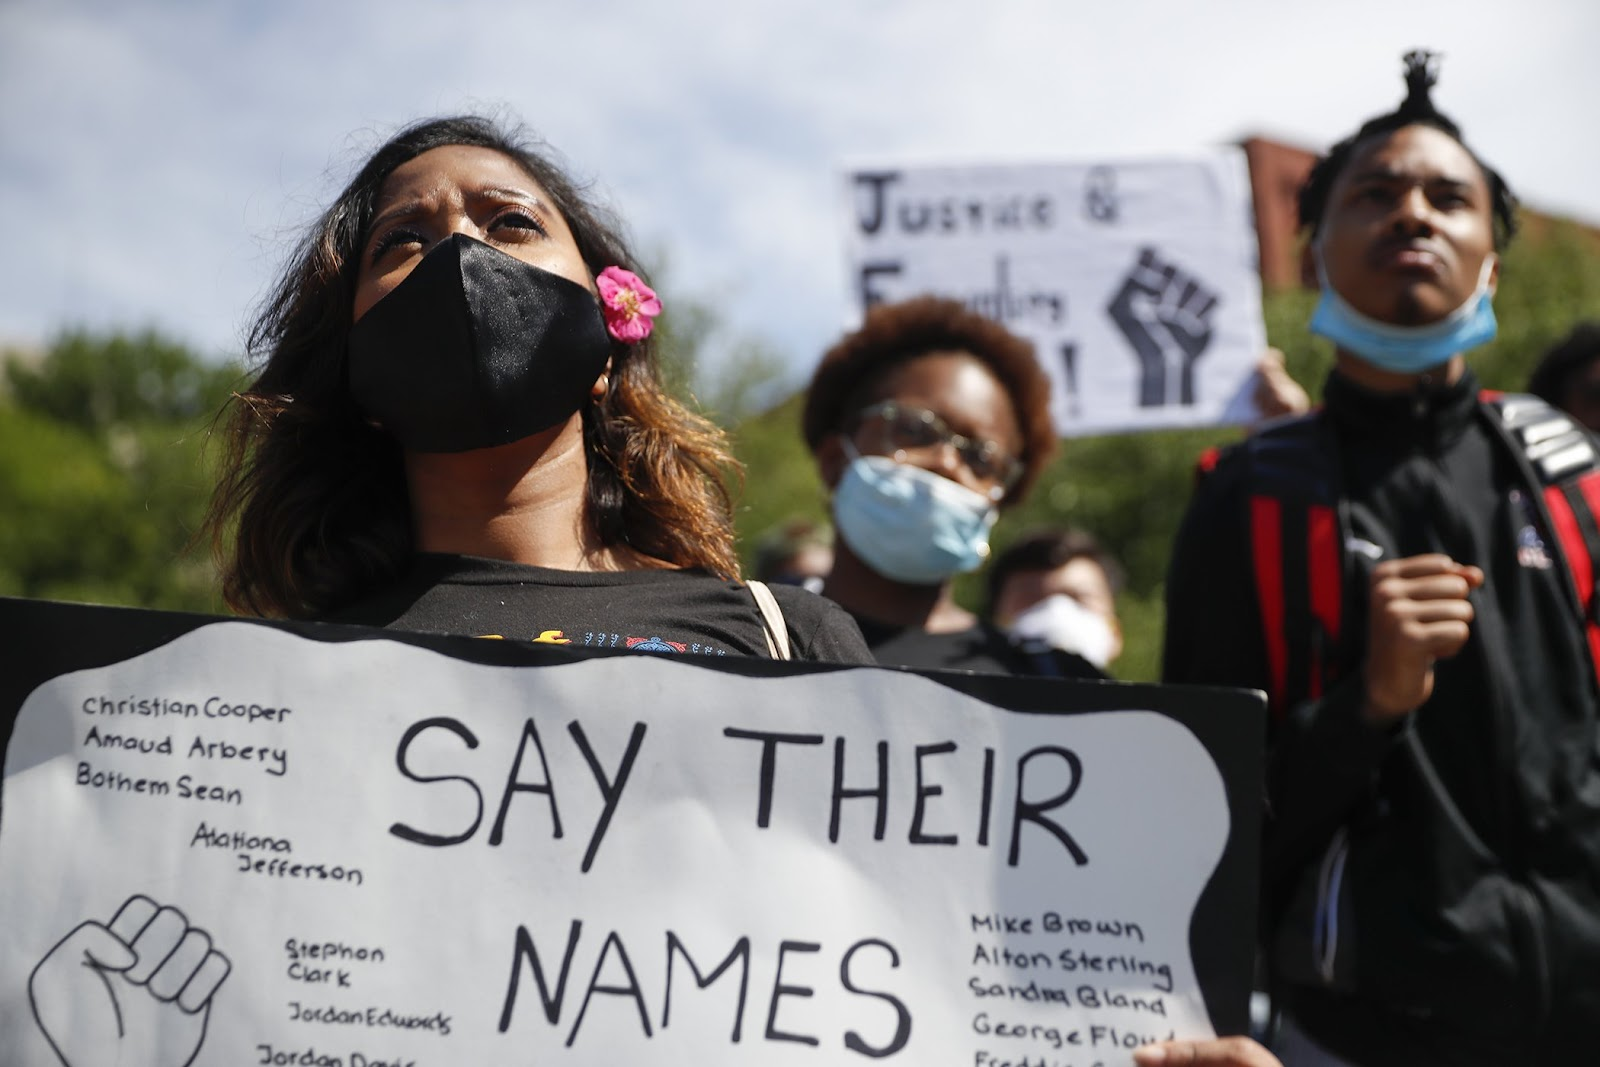 Global-Citizen-Anti-Racism-George-Floyd-Systemic-Racism-002.jpg